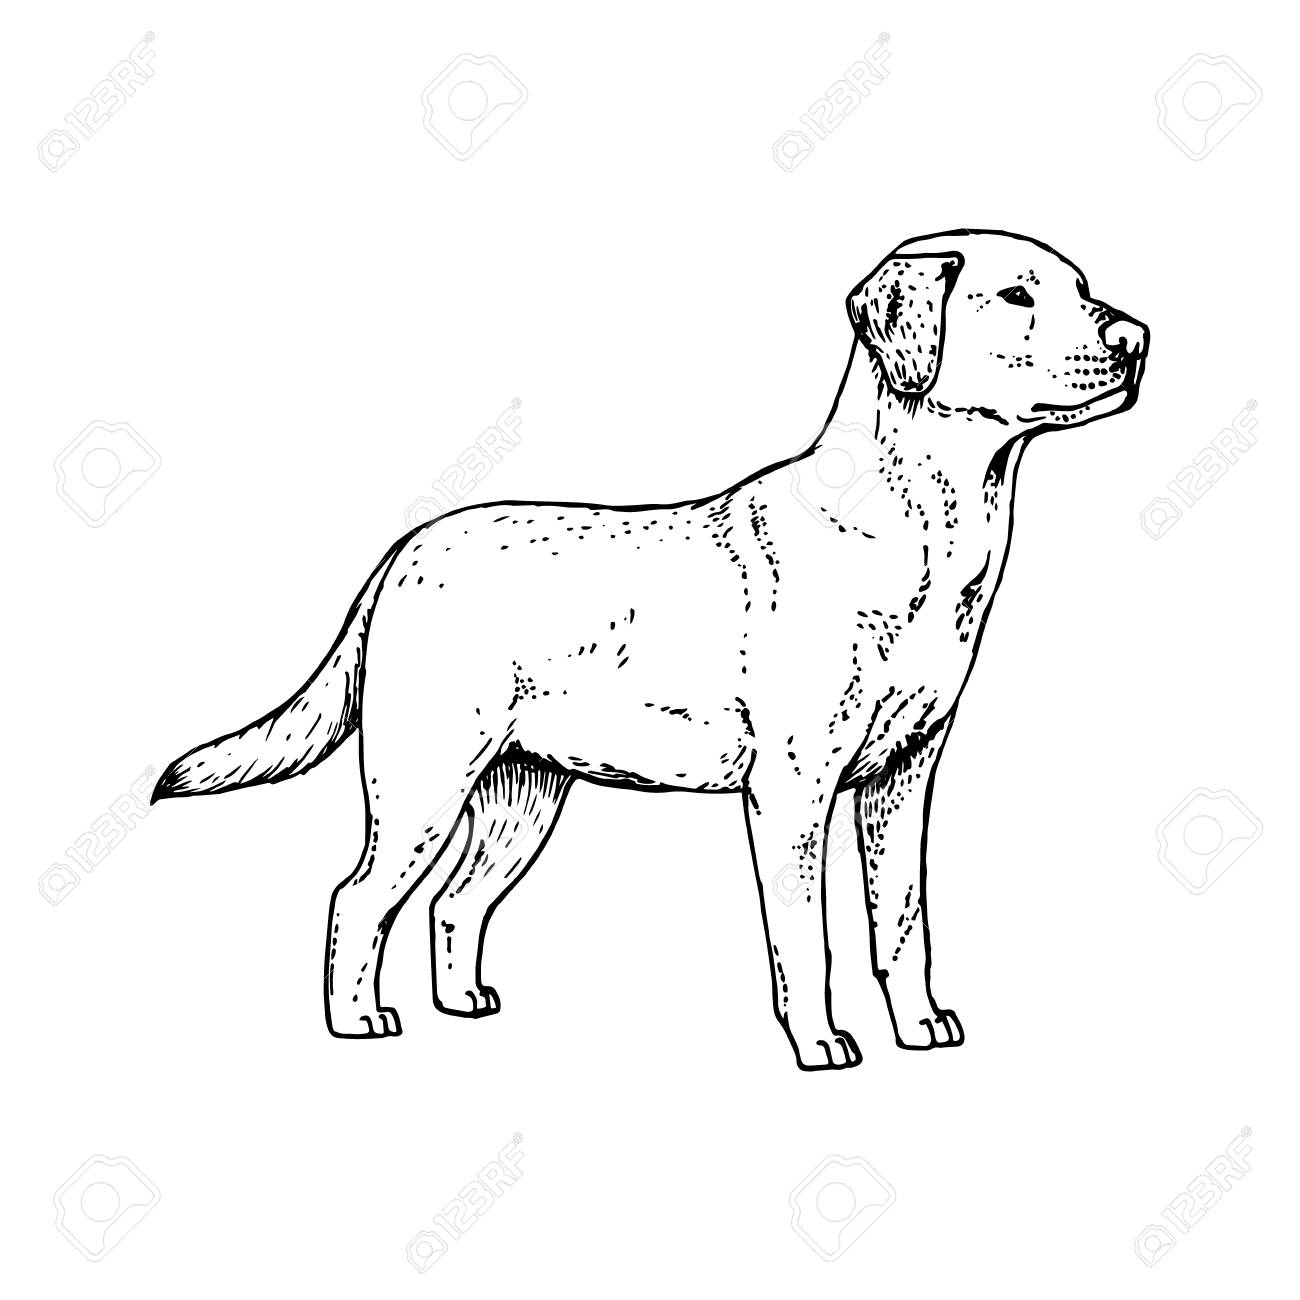 1300x1300 Hand Drawn Dog Labrador. Retro Realistic Animal Isolated. Vintage